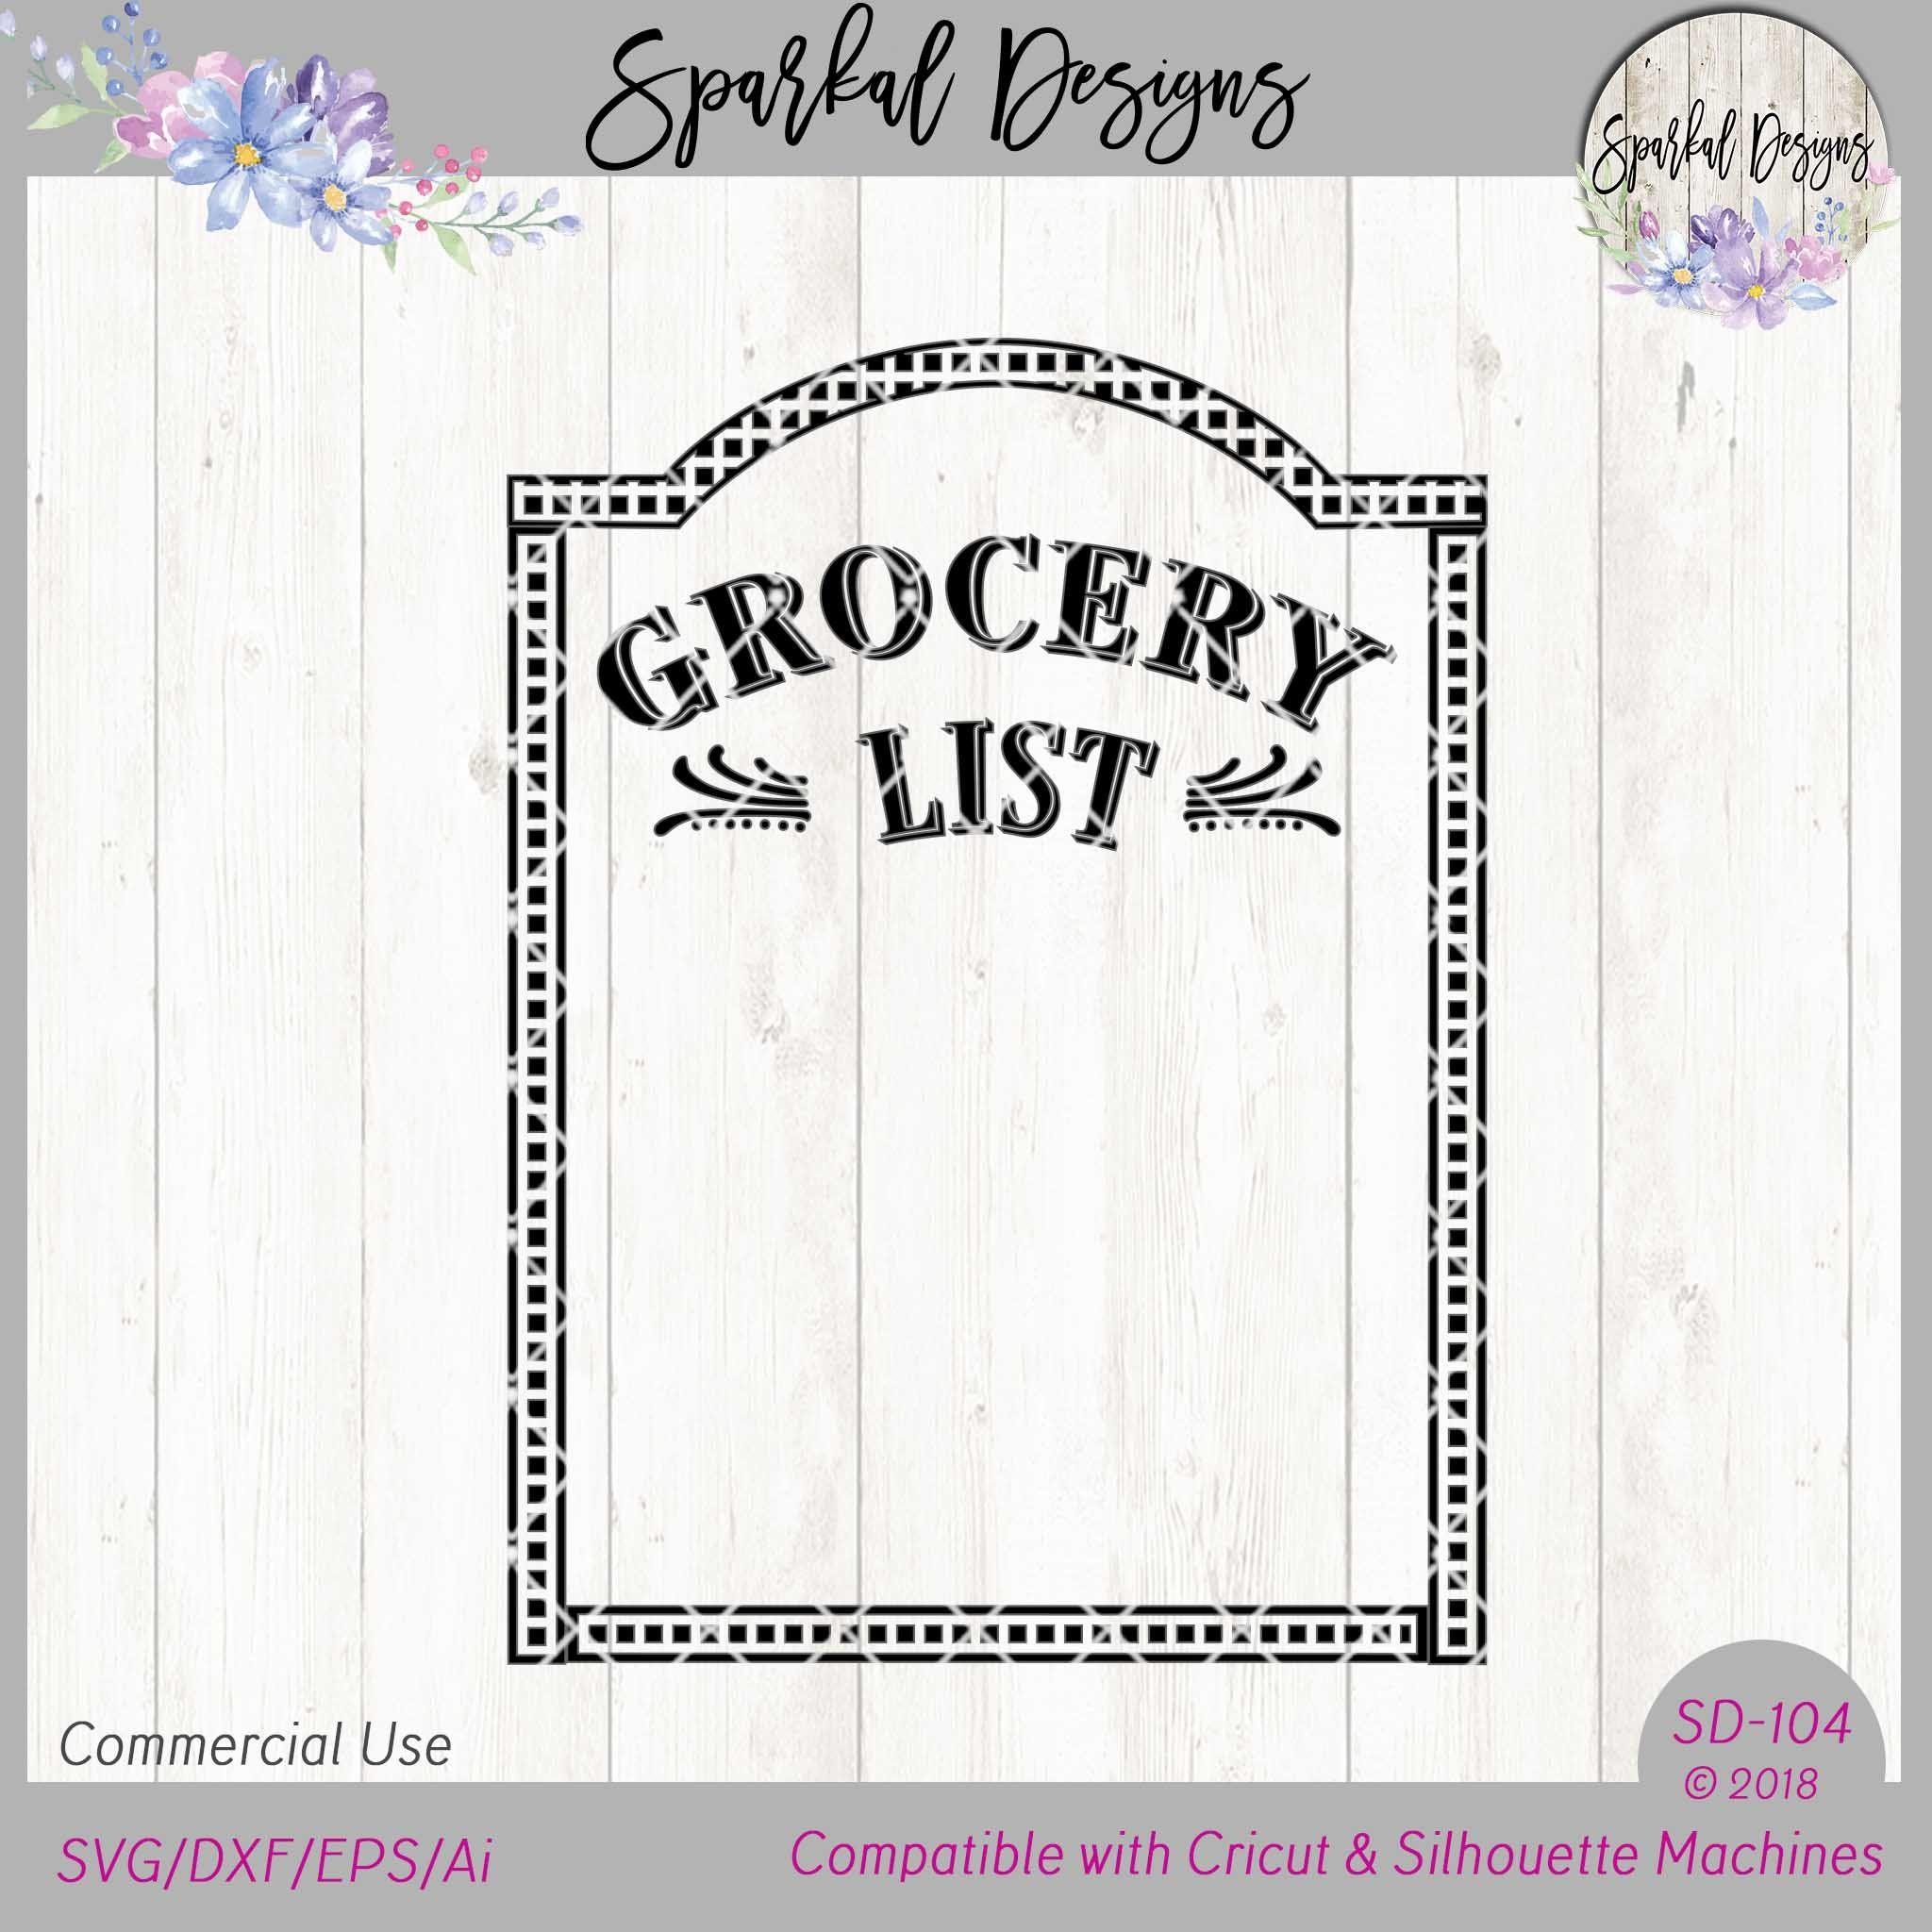 Grocery List Stencil File Svg Dxf Eps Silhouette Machine Sign Maker Cricut